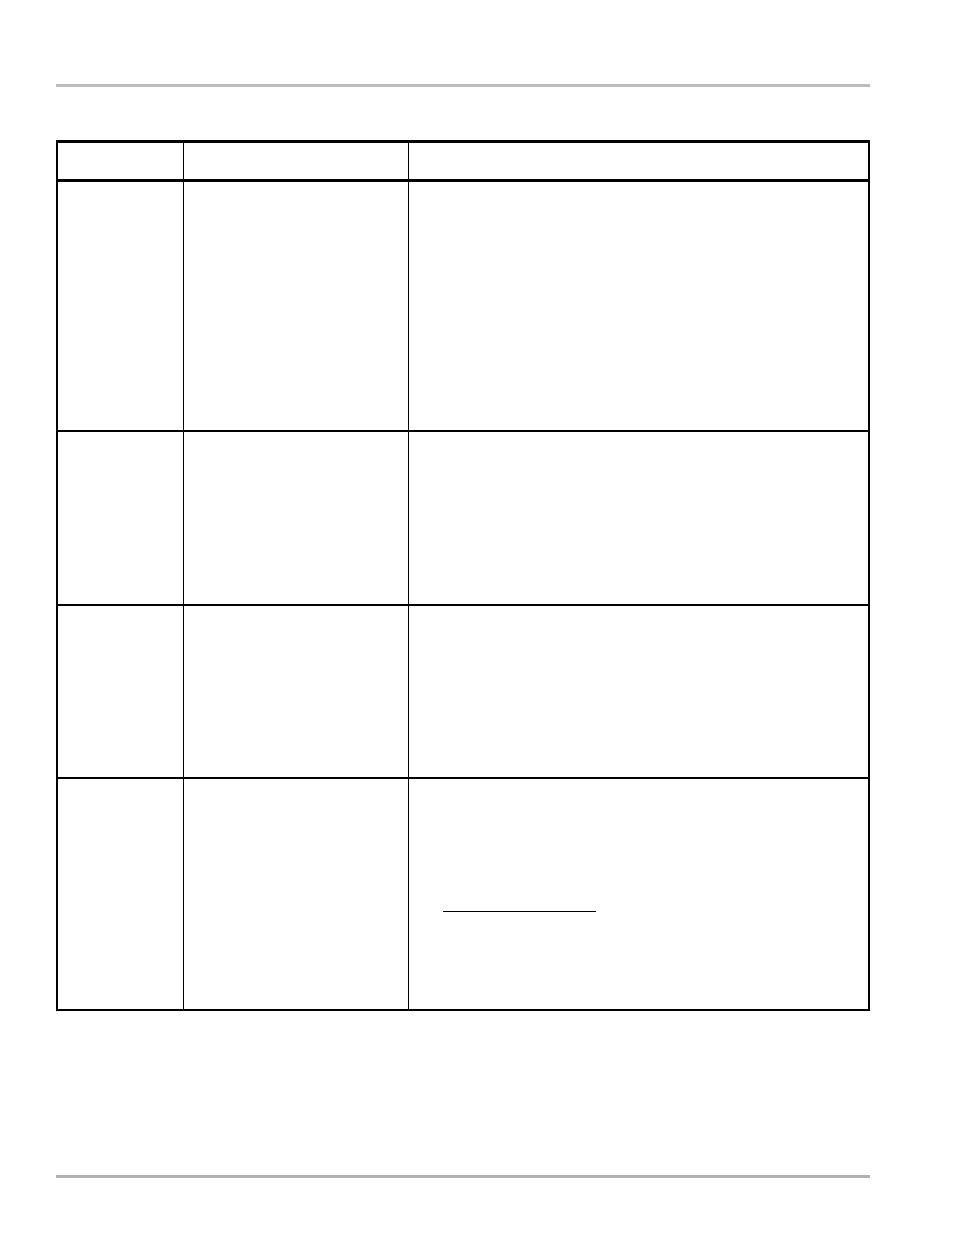 Lcr-ii troubleshooting guide | Liquid Controls LCR-II Setup ...